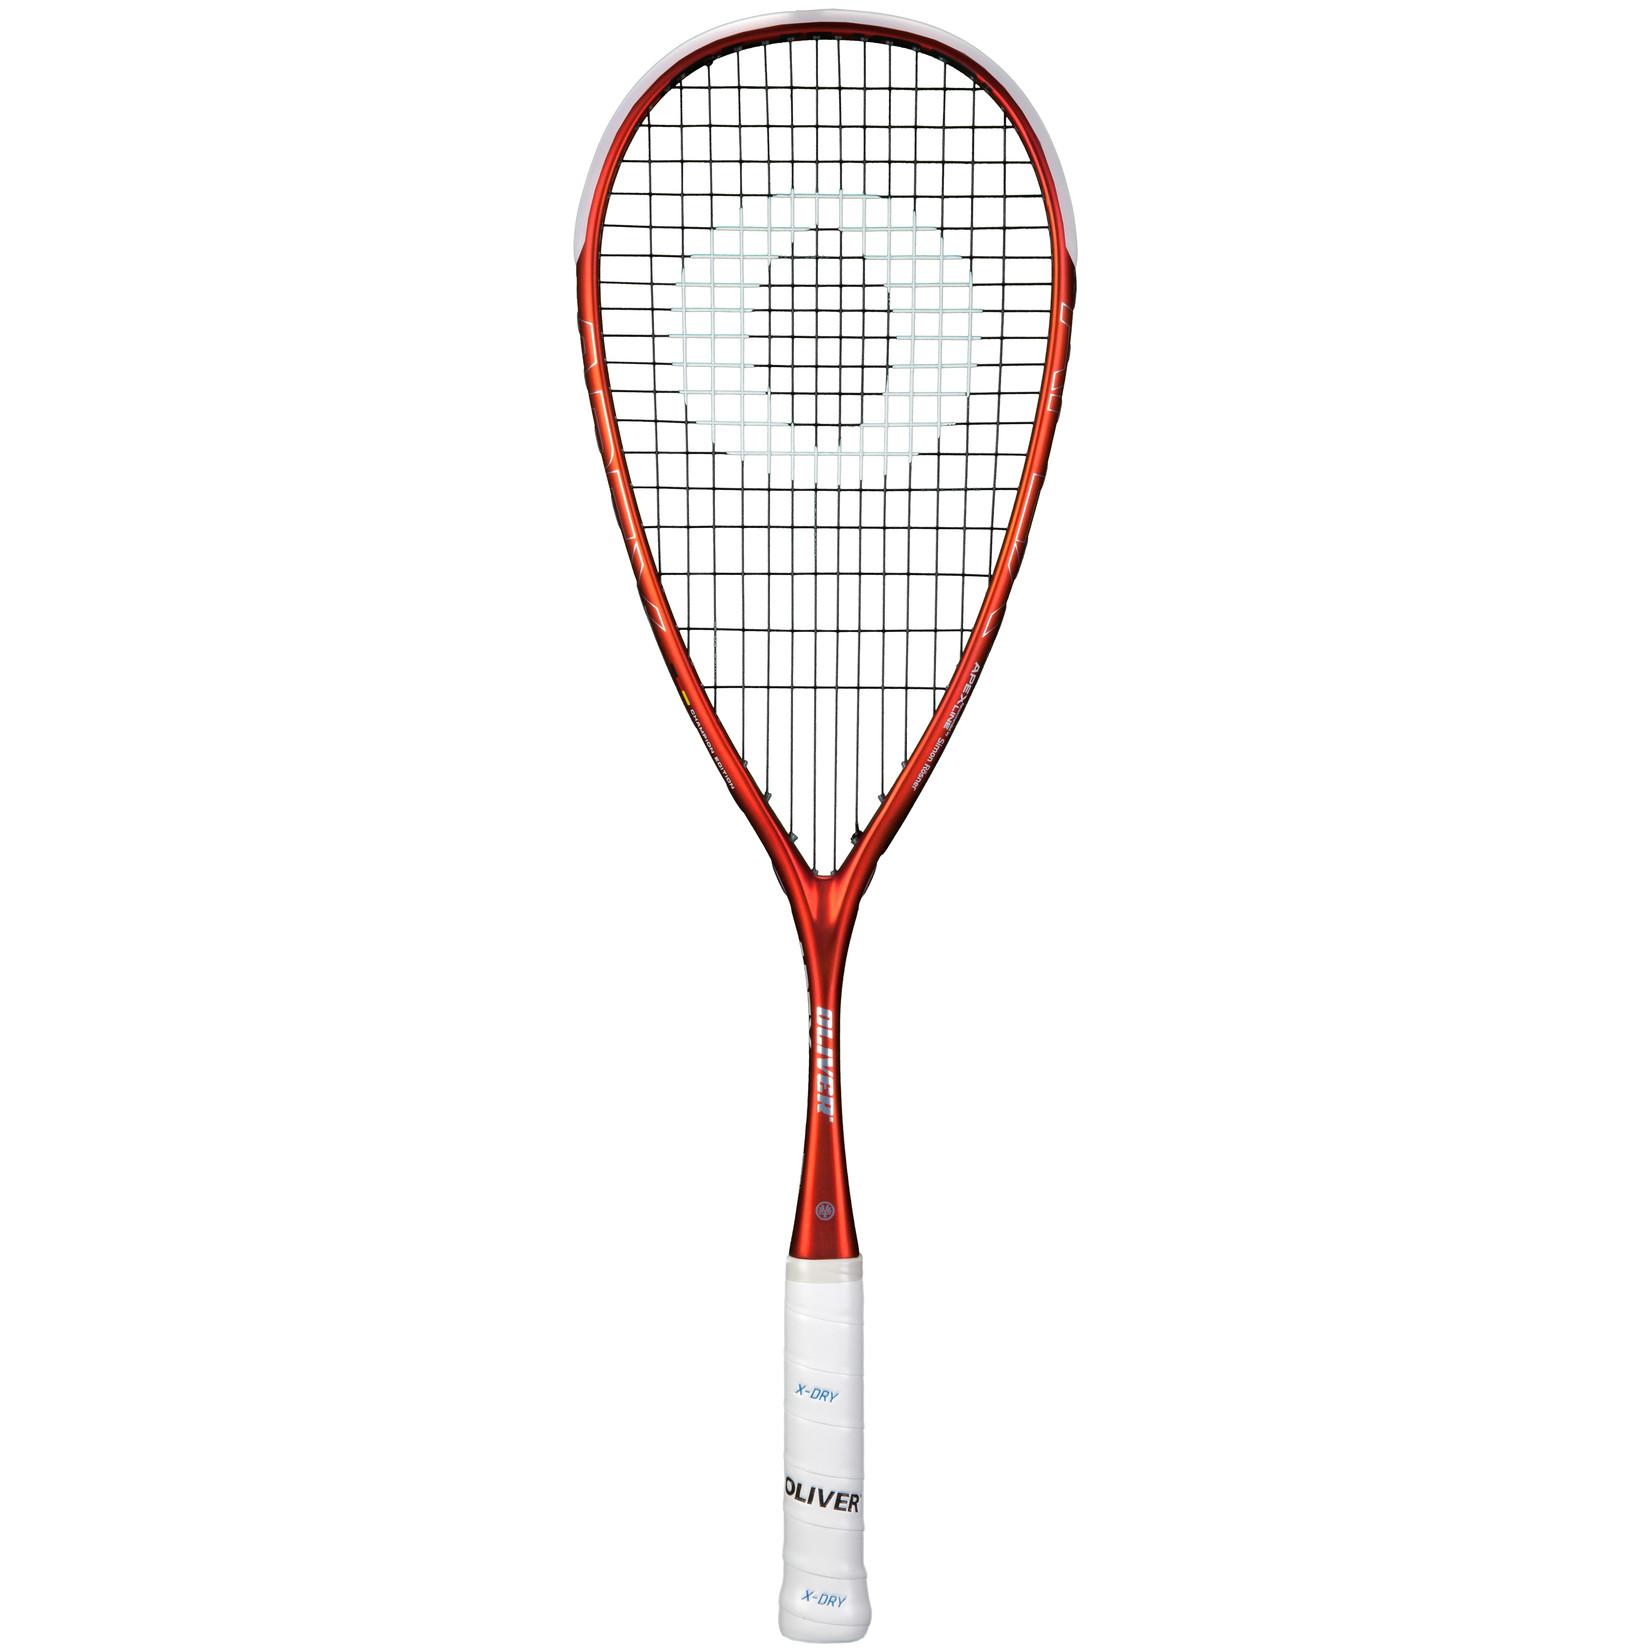 Oliver Apex 550 squashracket